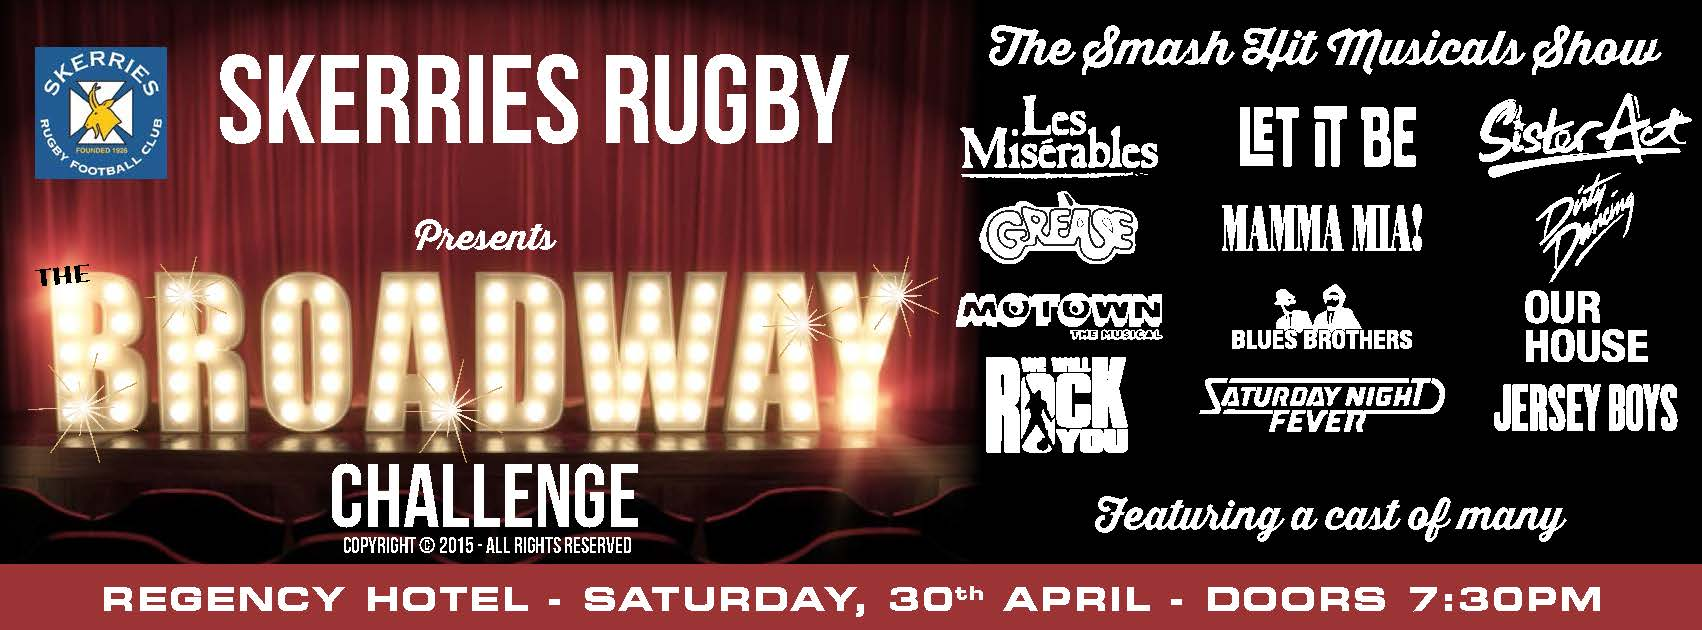 Broadway Challenge Skerries Rugby  Facebook Banner (1)